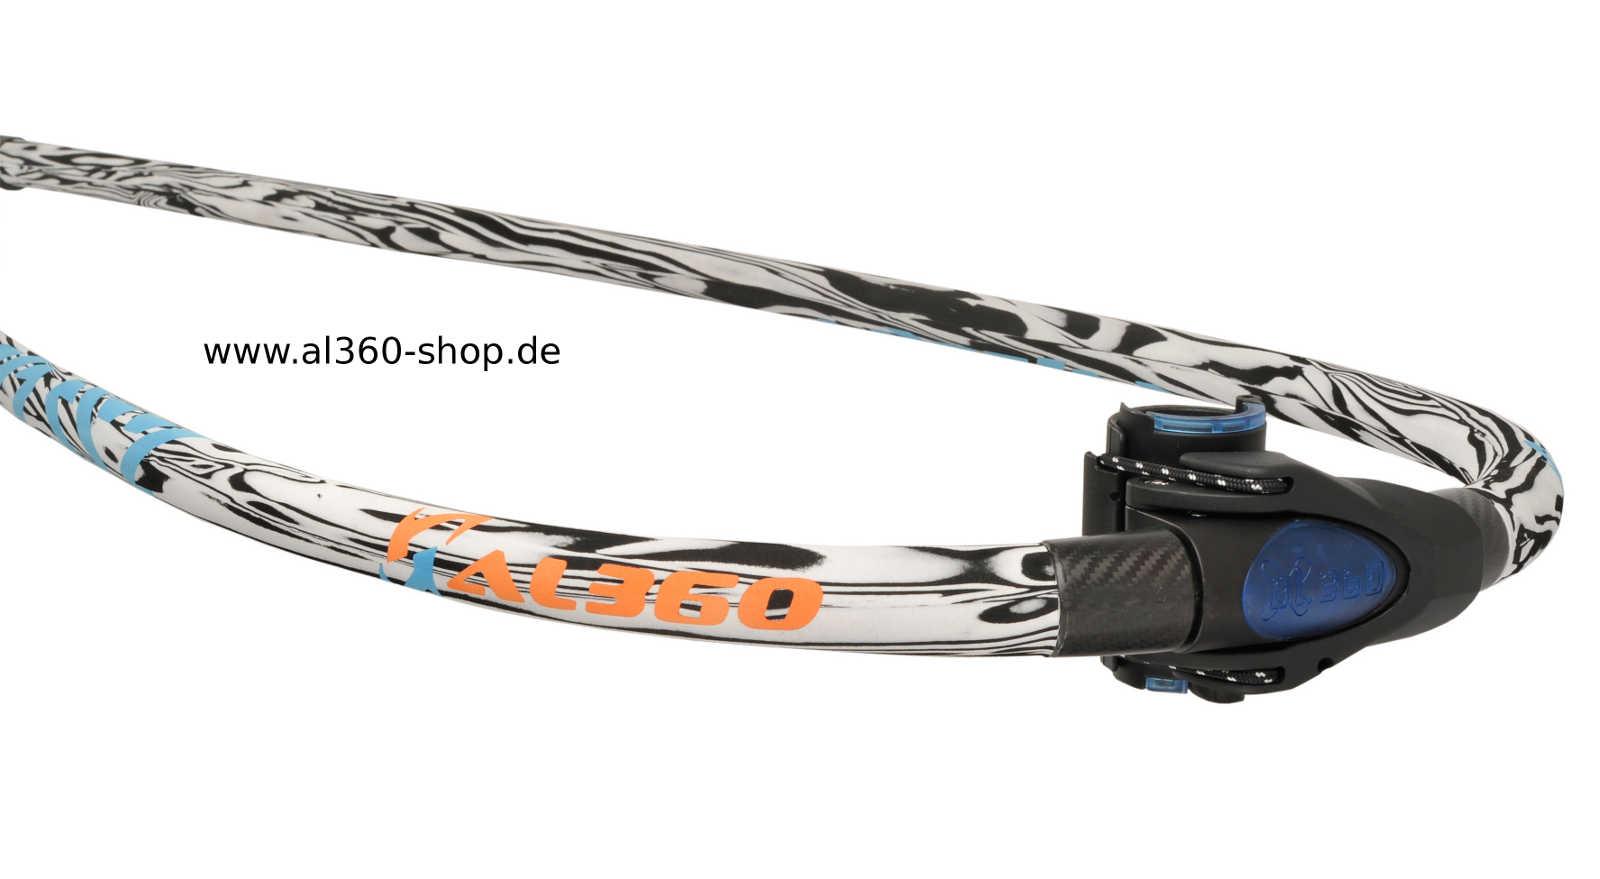 Die Front der AL360 Race Team Edition / RTE für Slalom o. Race